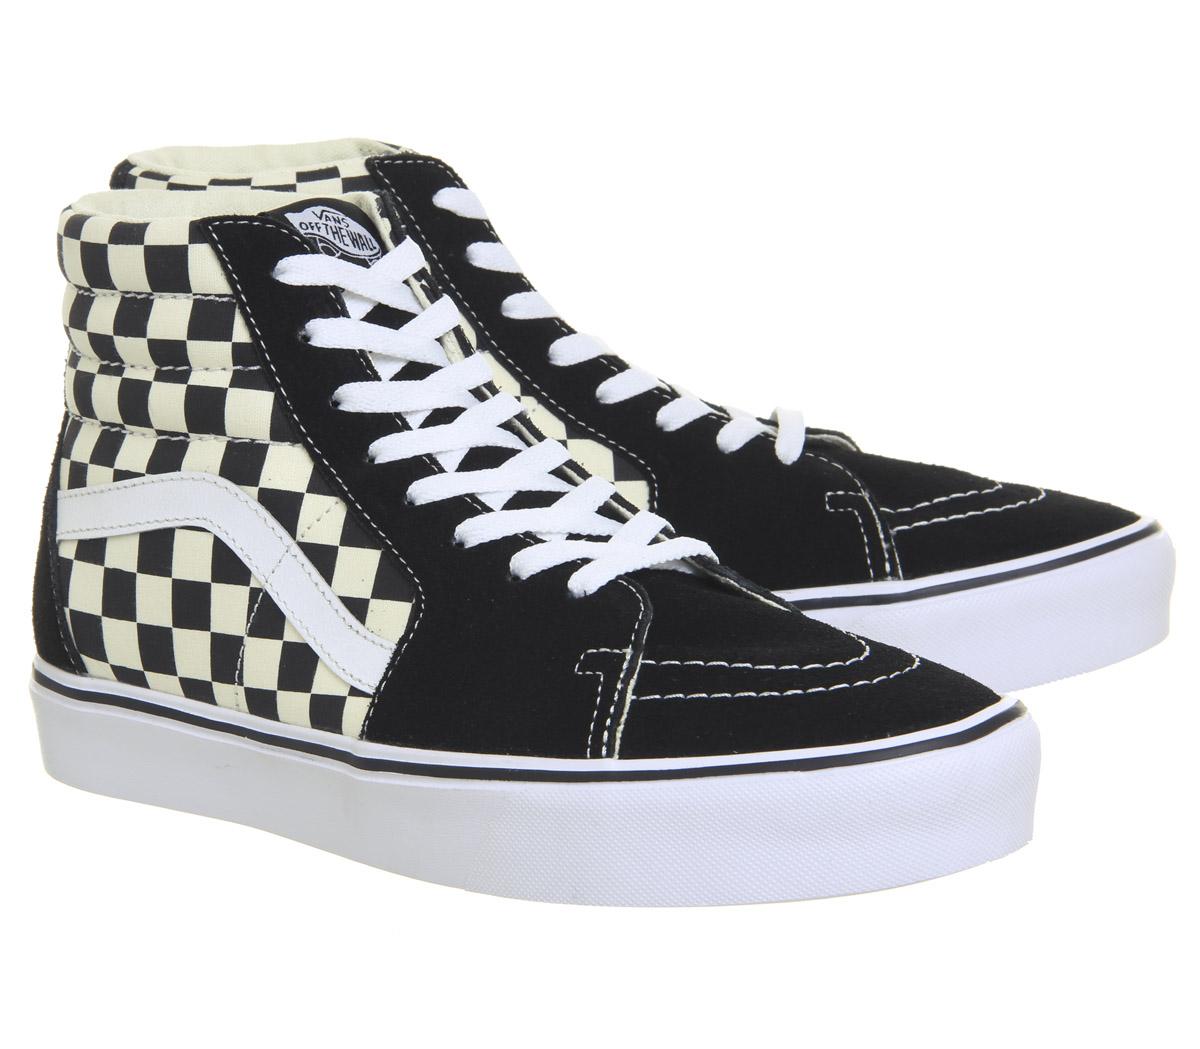 Vans Sk8 Hi Lite Negro Blanco Zapatos tenis de tablero de ajedrez  6a4b79f141f64